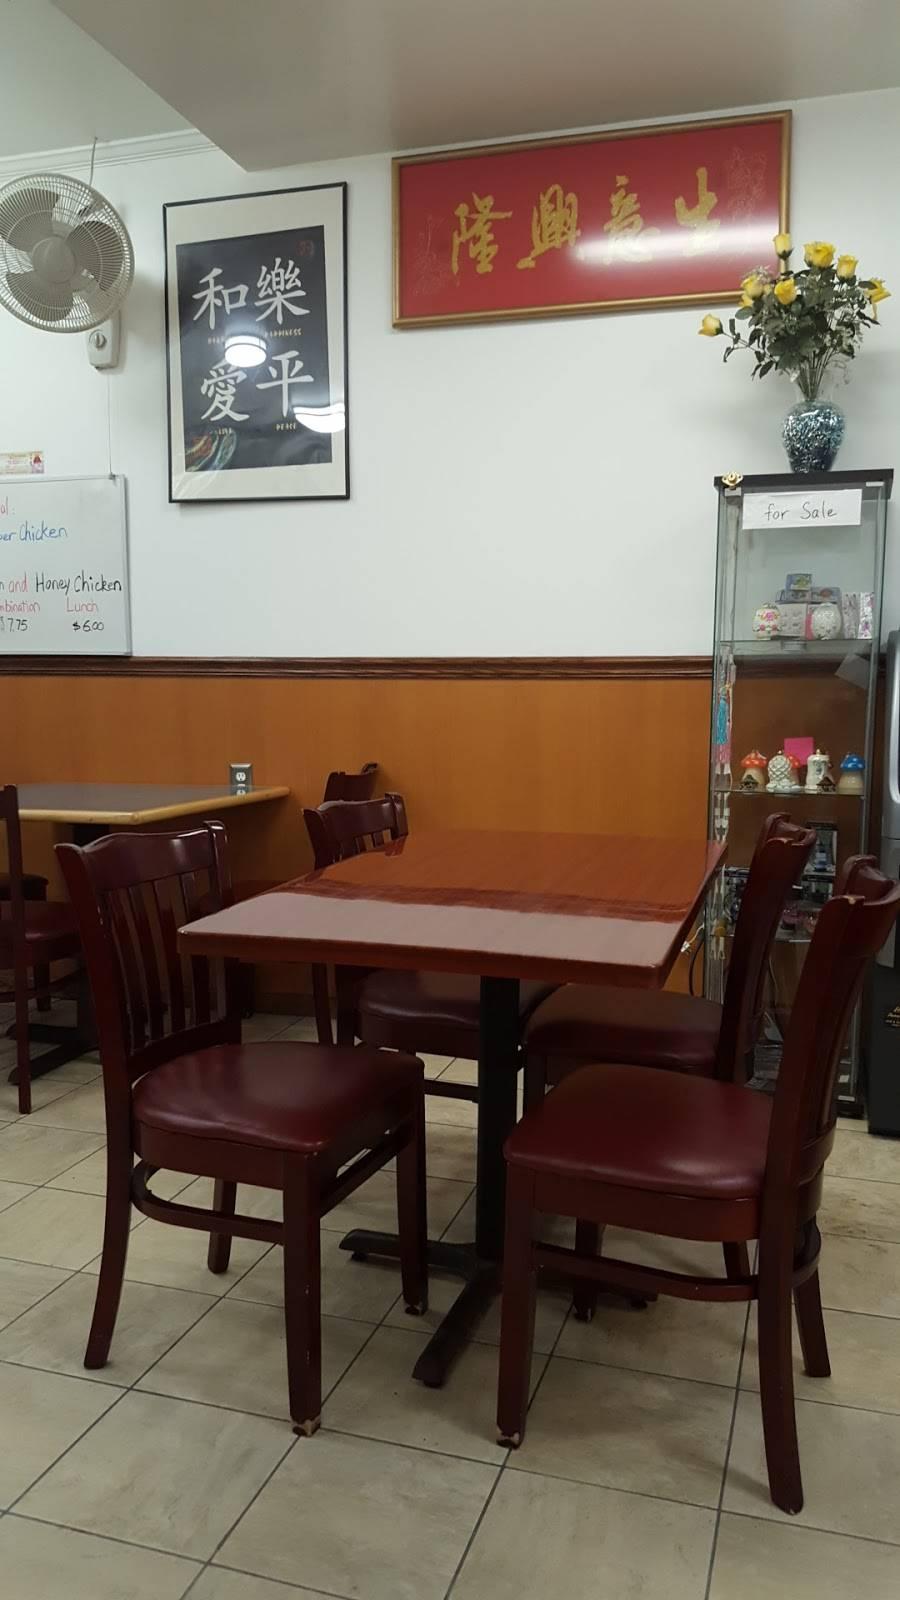 Chinatown Restaurant | restaurant | 20 E Main St, Bloomsburg, PA 17815, USA | 5703899177 OR +1 570-389-9177